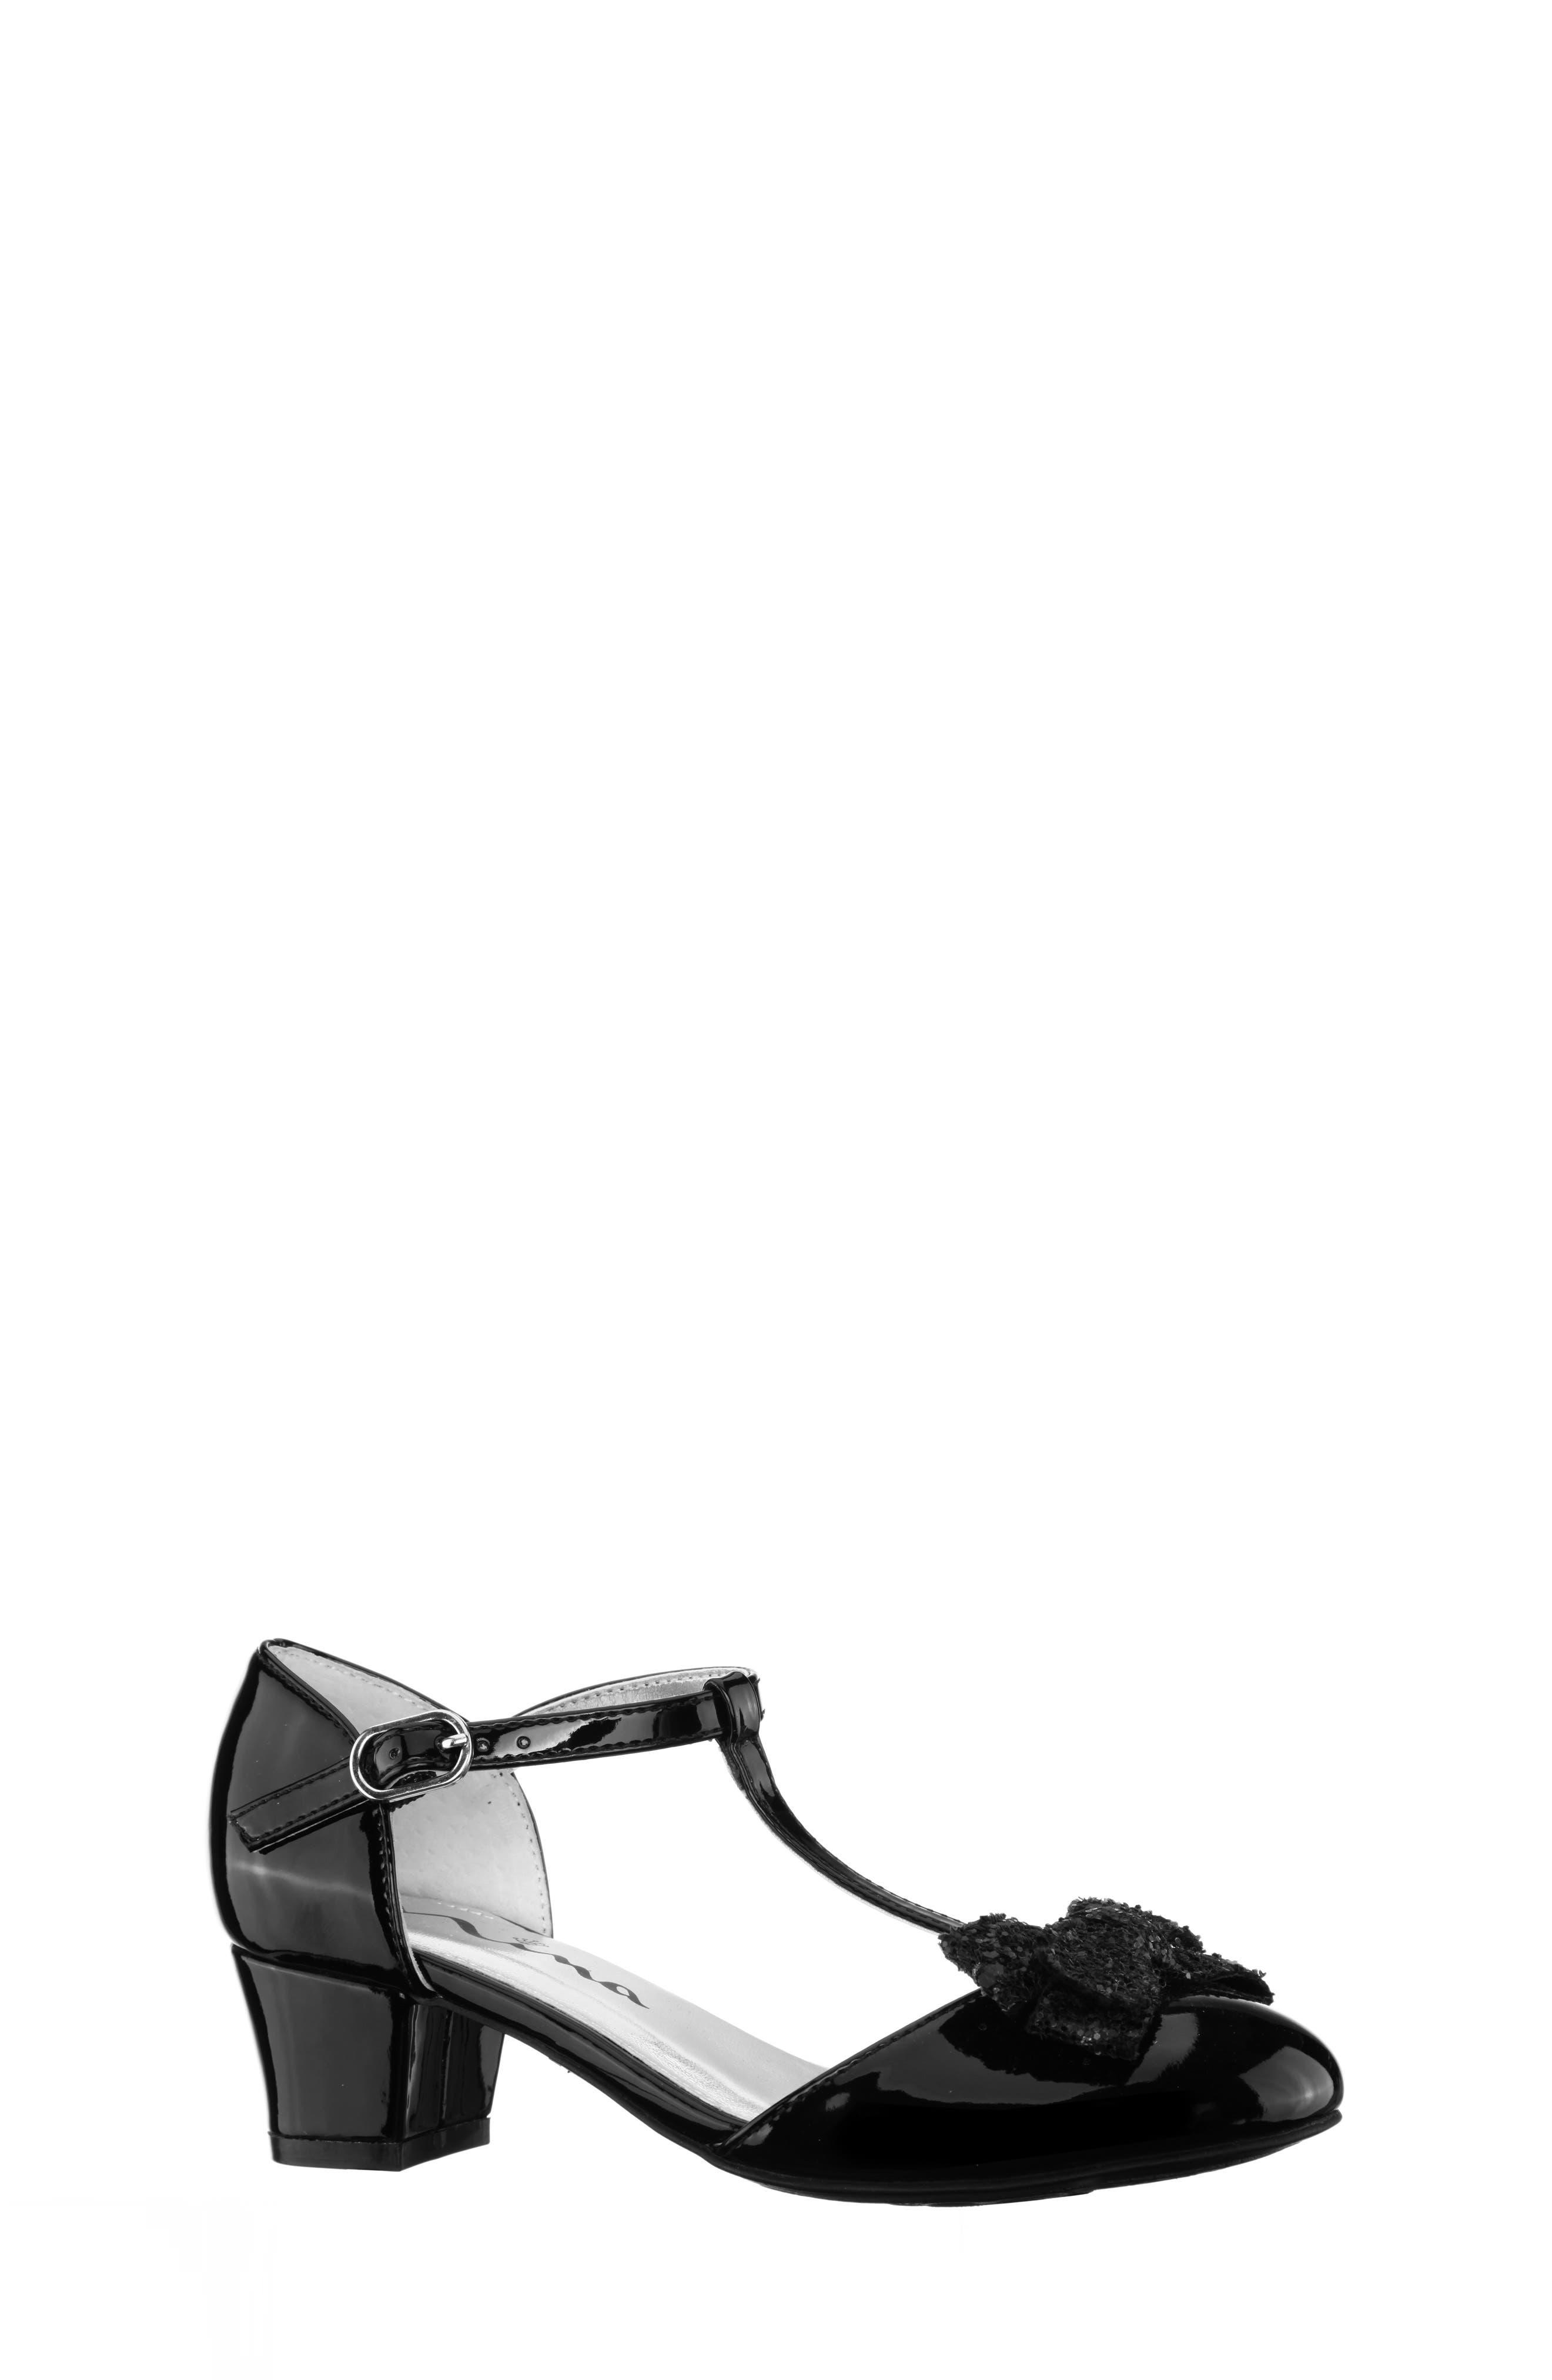 111c7cfc172 Girls' Nina Shoes | Nordstrom